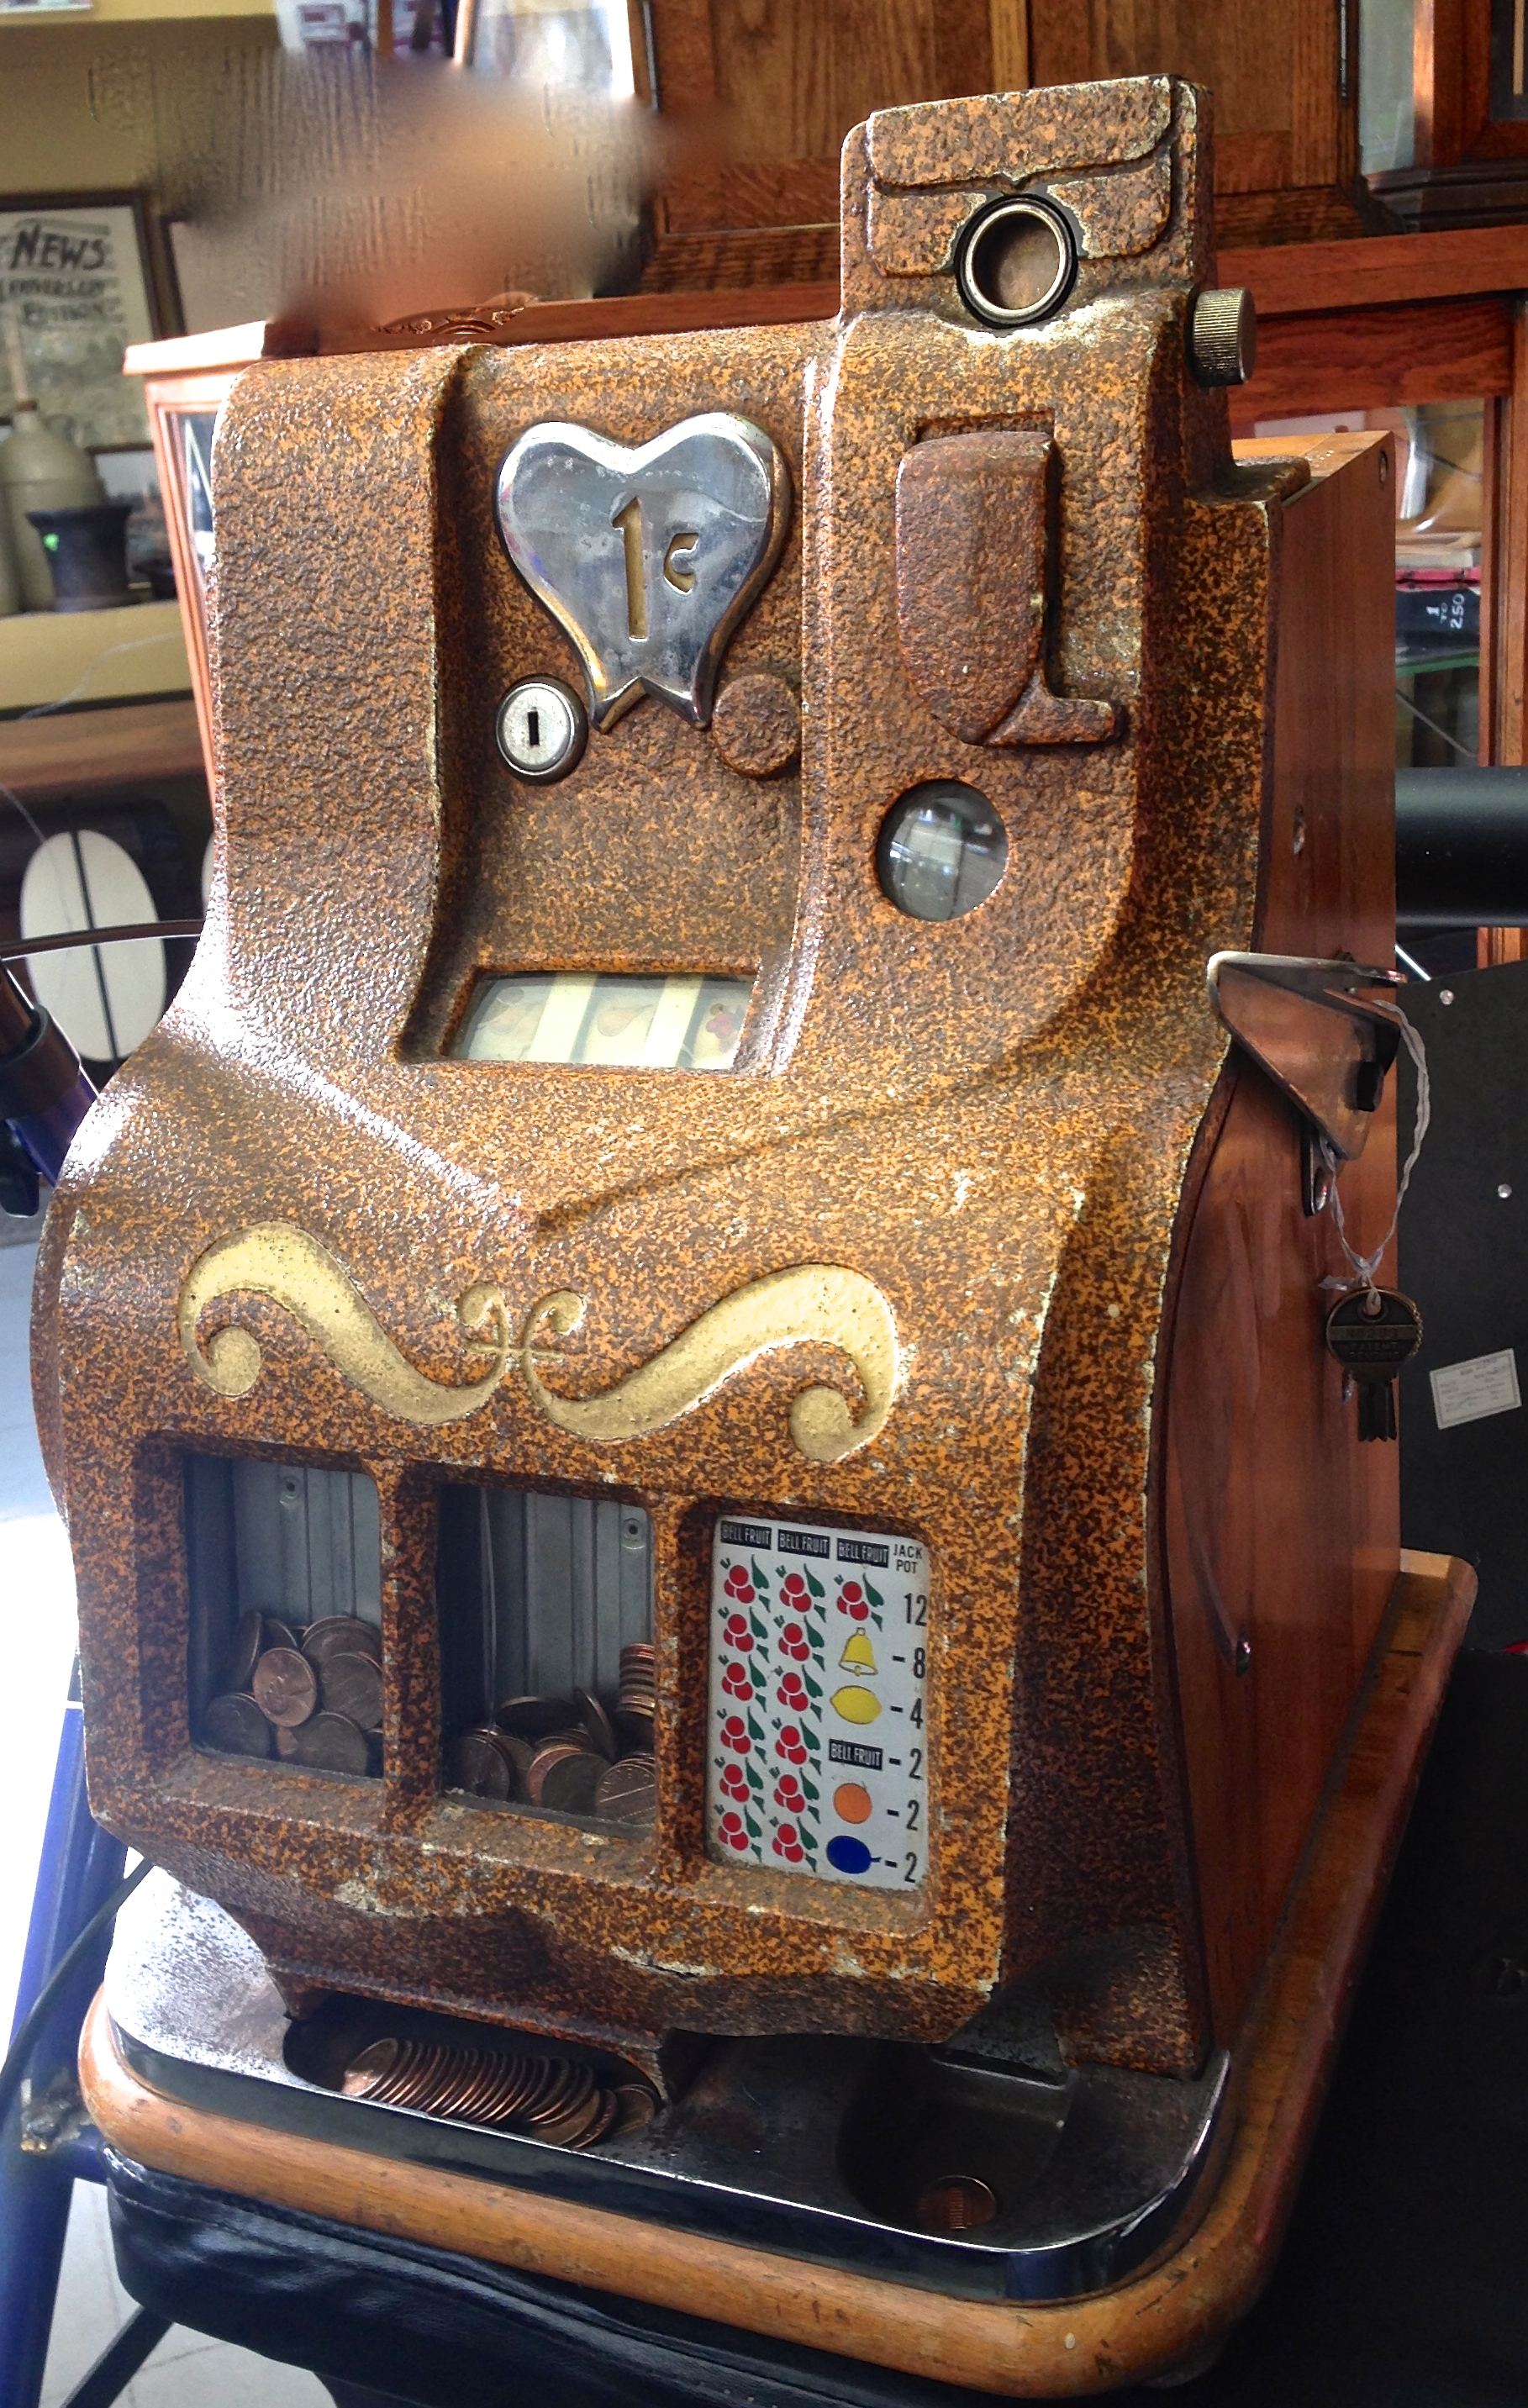 Slot Machines & Coin-op